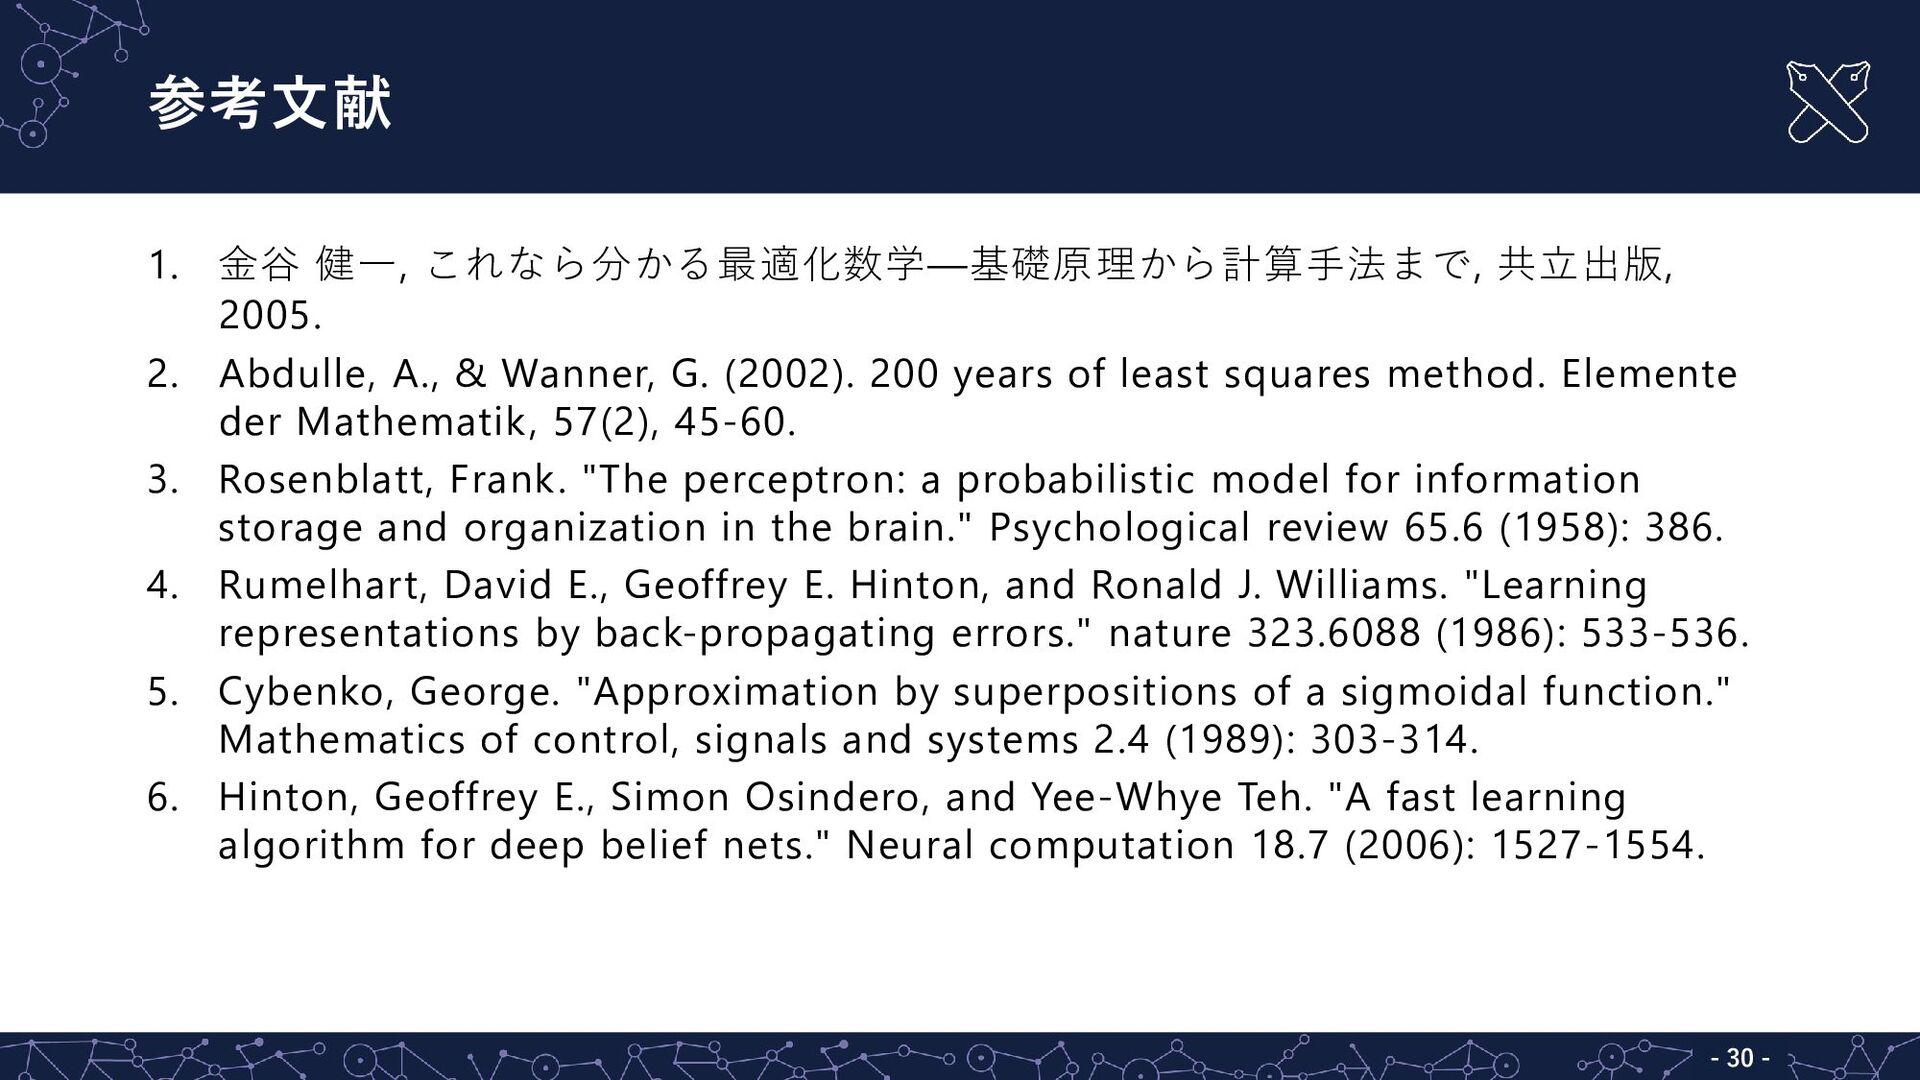 情報工学科 杉浦孔明 Email: komei.sugiura@keio.jp Slack: ...